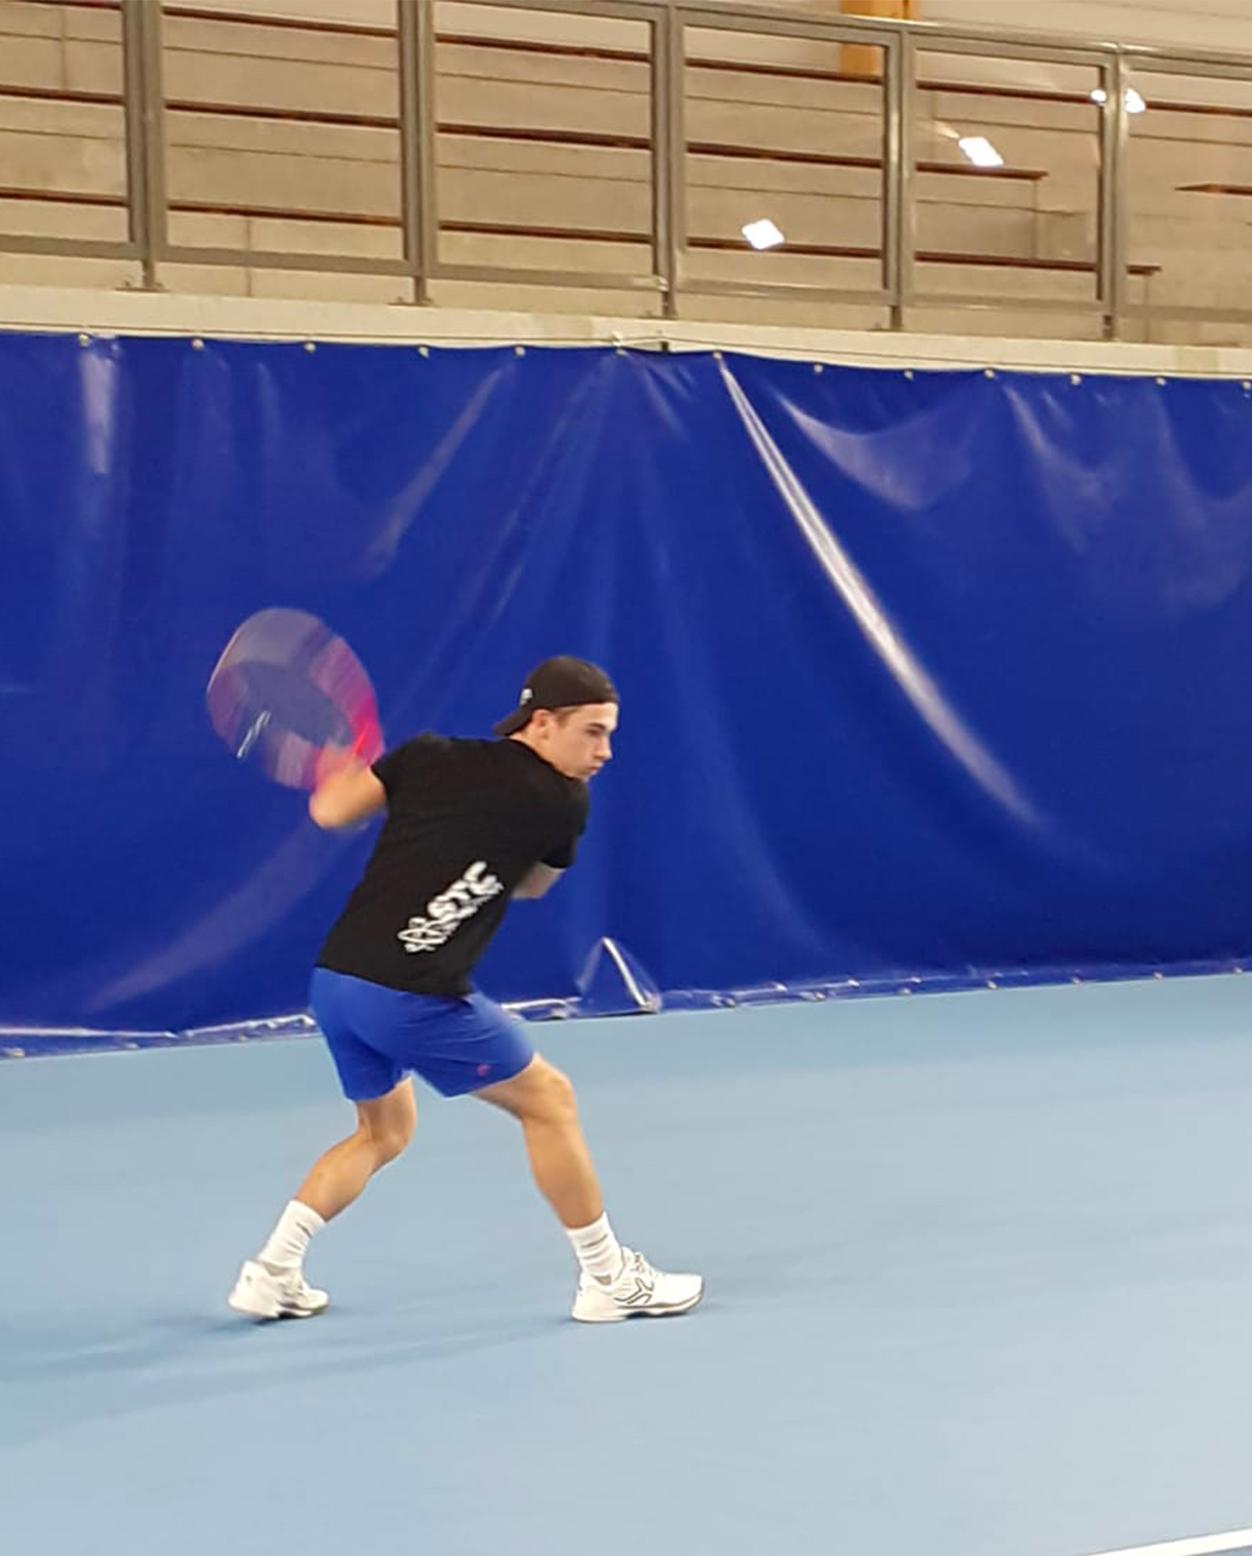 https://www.team-bms-tennis.fr/wp-content/uploads/2020/10/ZacharyJousserand.jpg